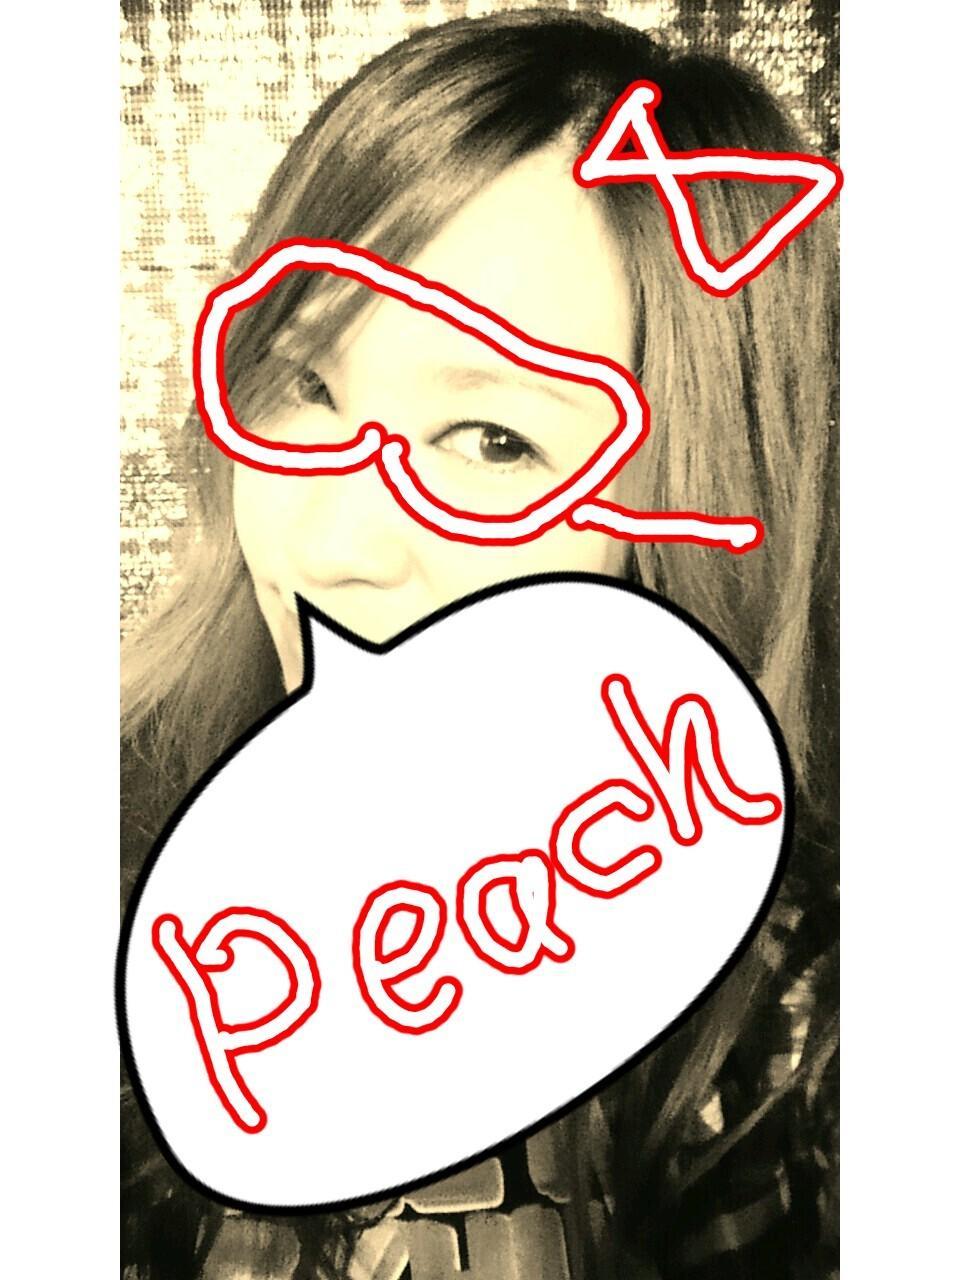 peach(ネイル勉強中☆ミユコ)